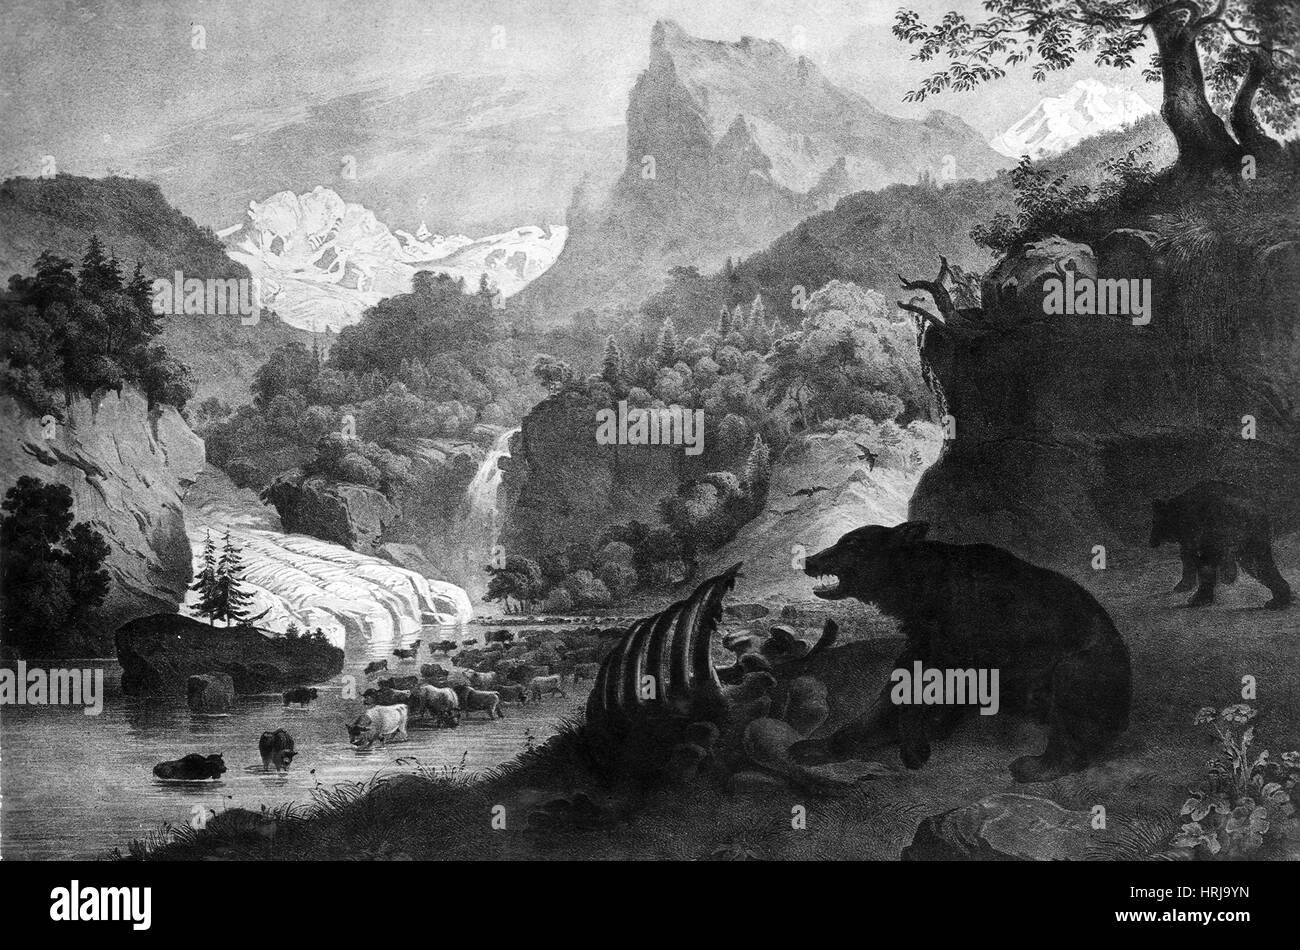 Prehistoric, Pleistocene Landscape - Stock Image